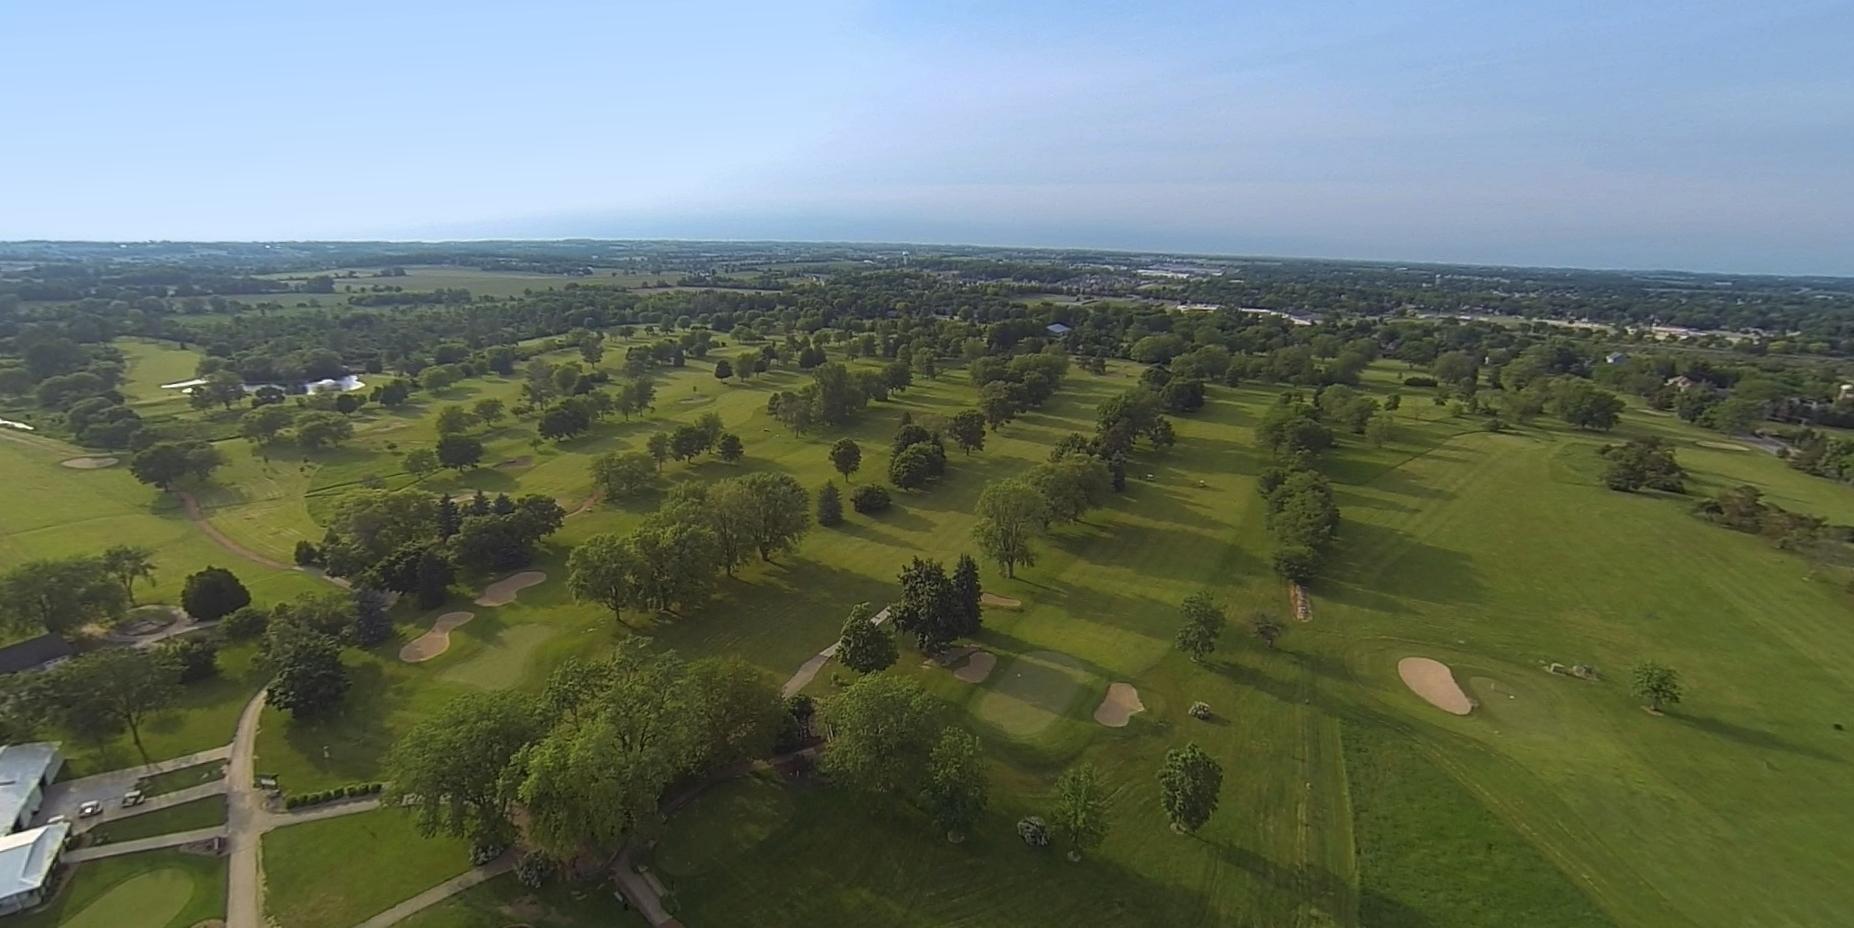 Hartford Golf Club – Quadcopter Shots